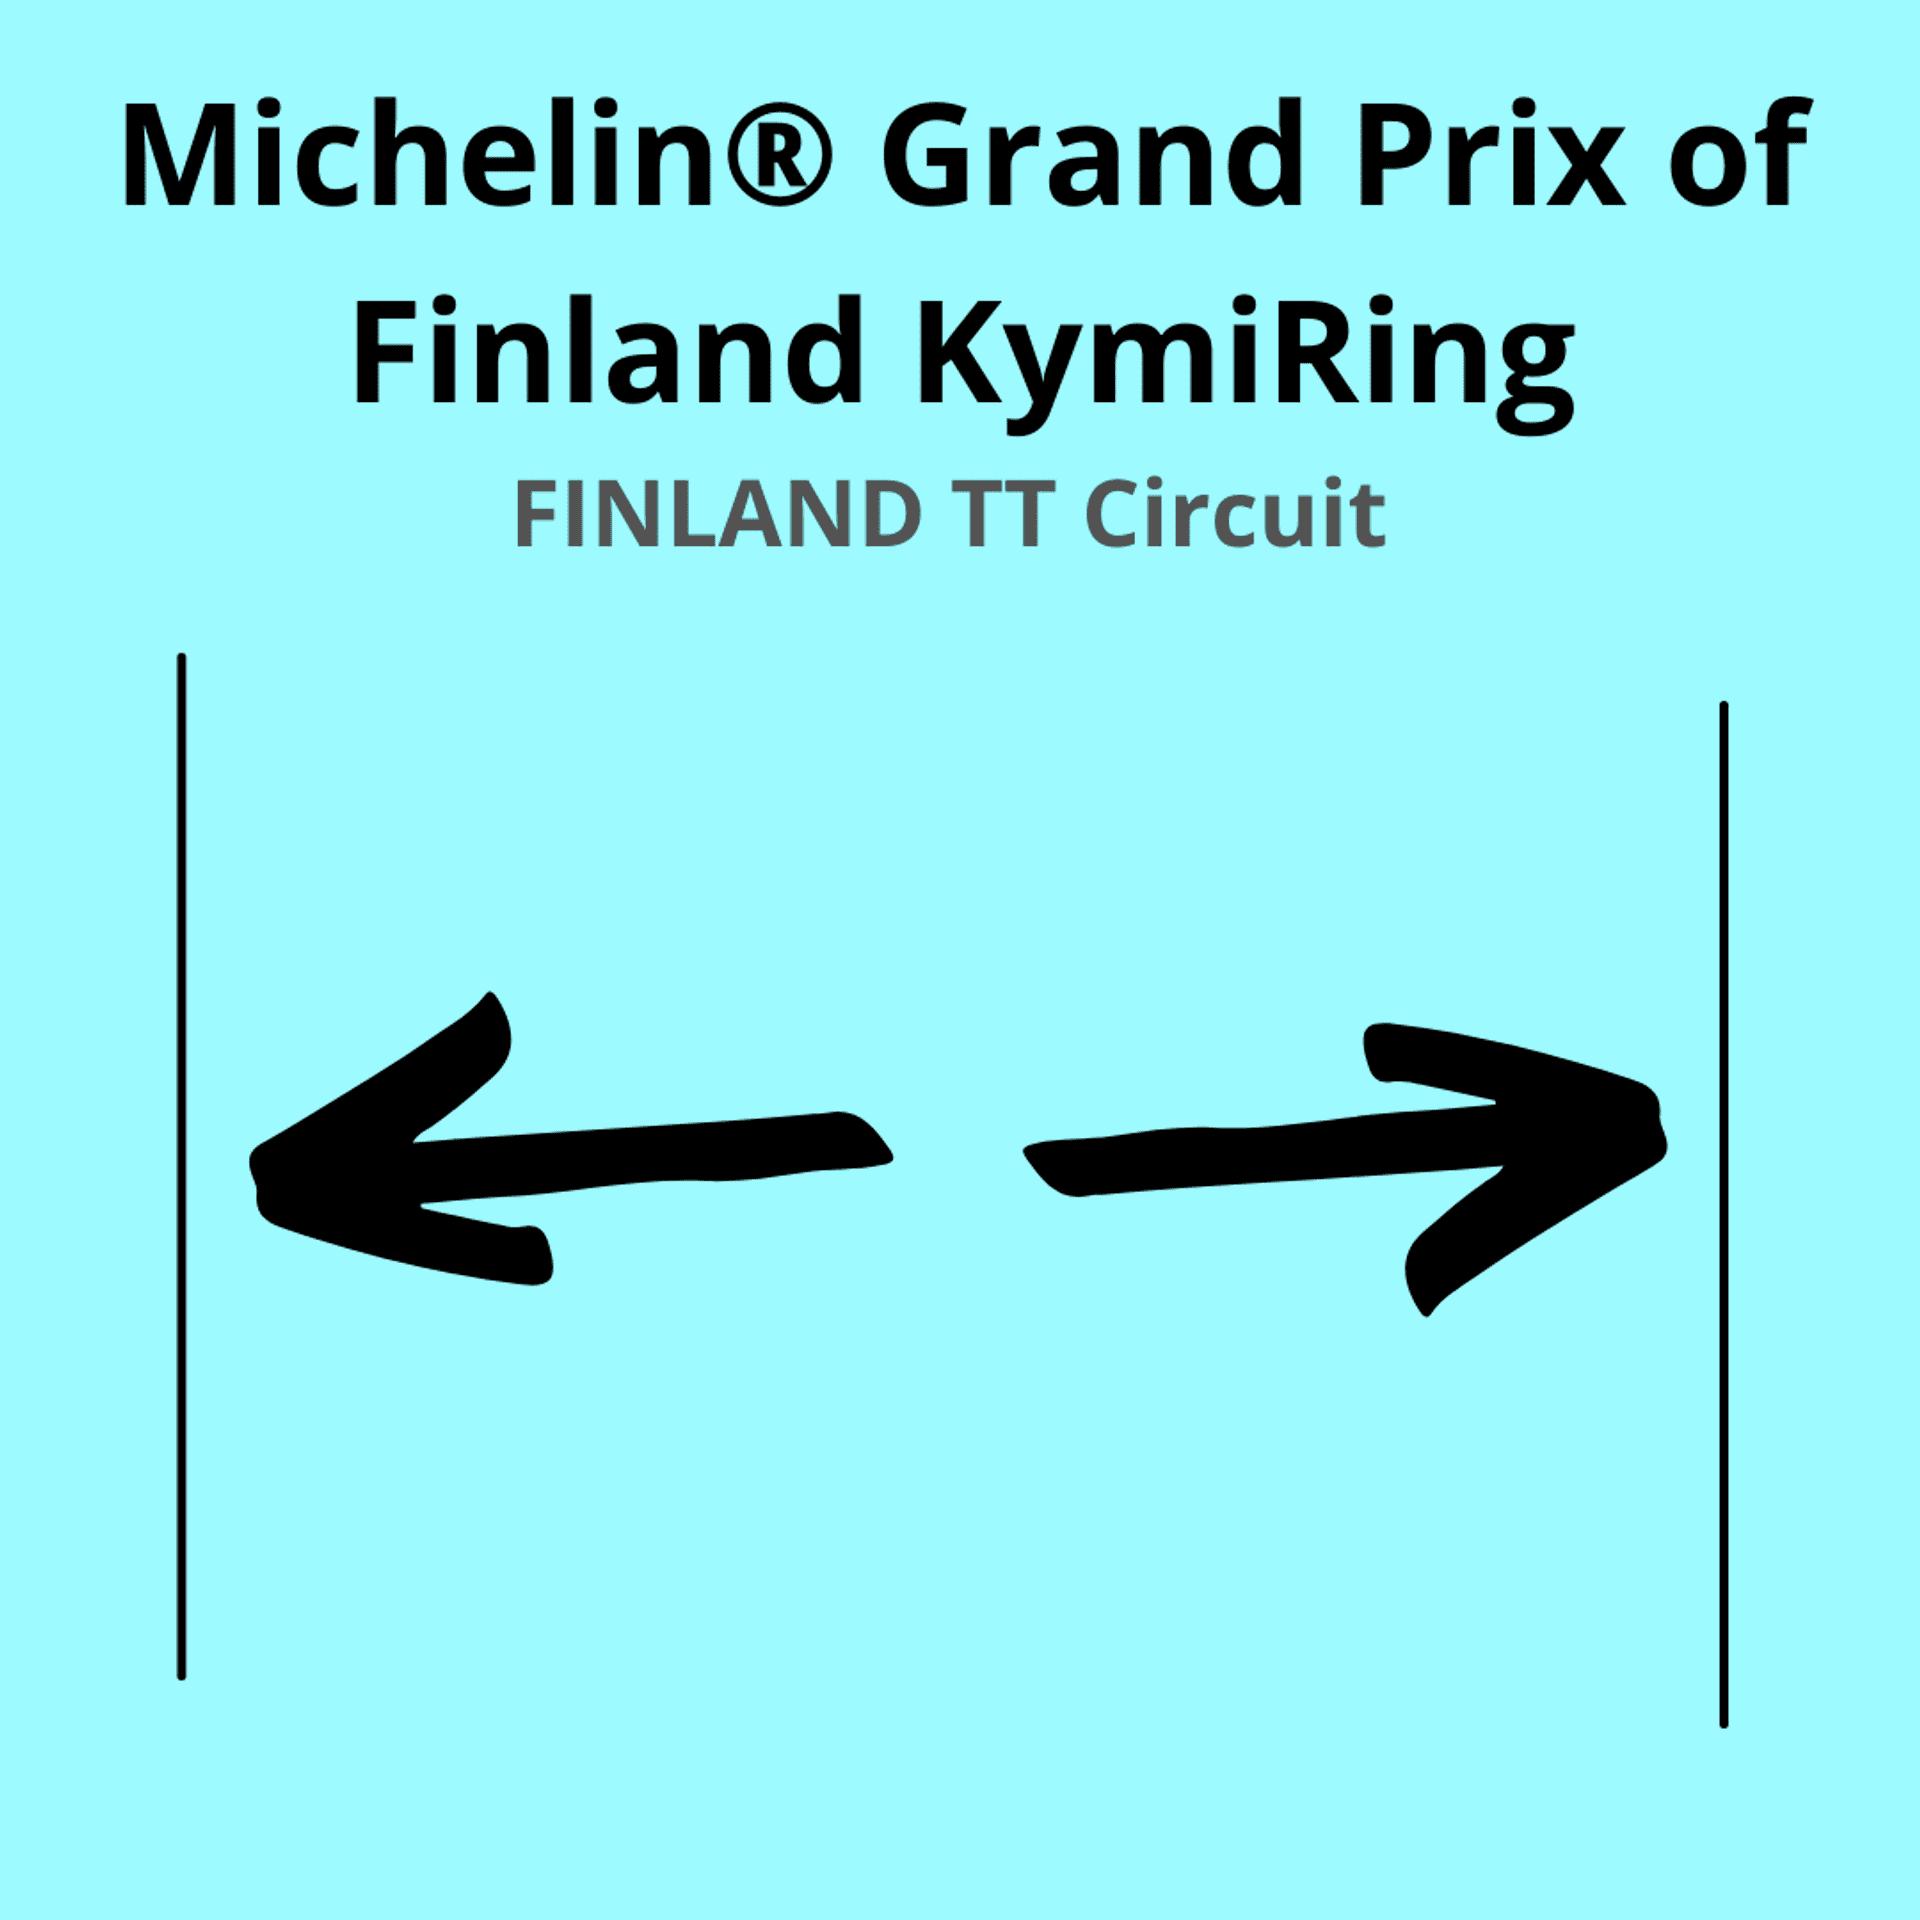 Michelin® Grand Prix of Finland KymiRing